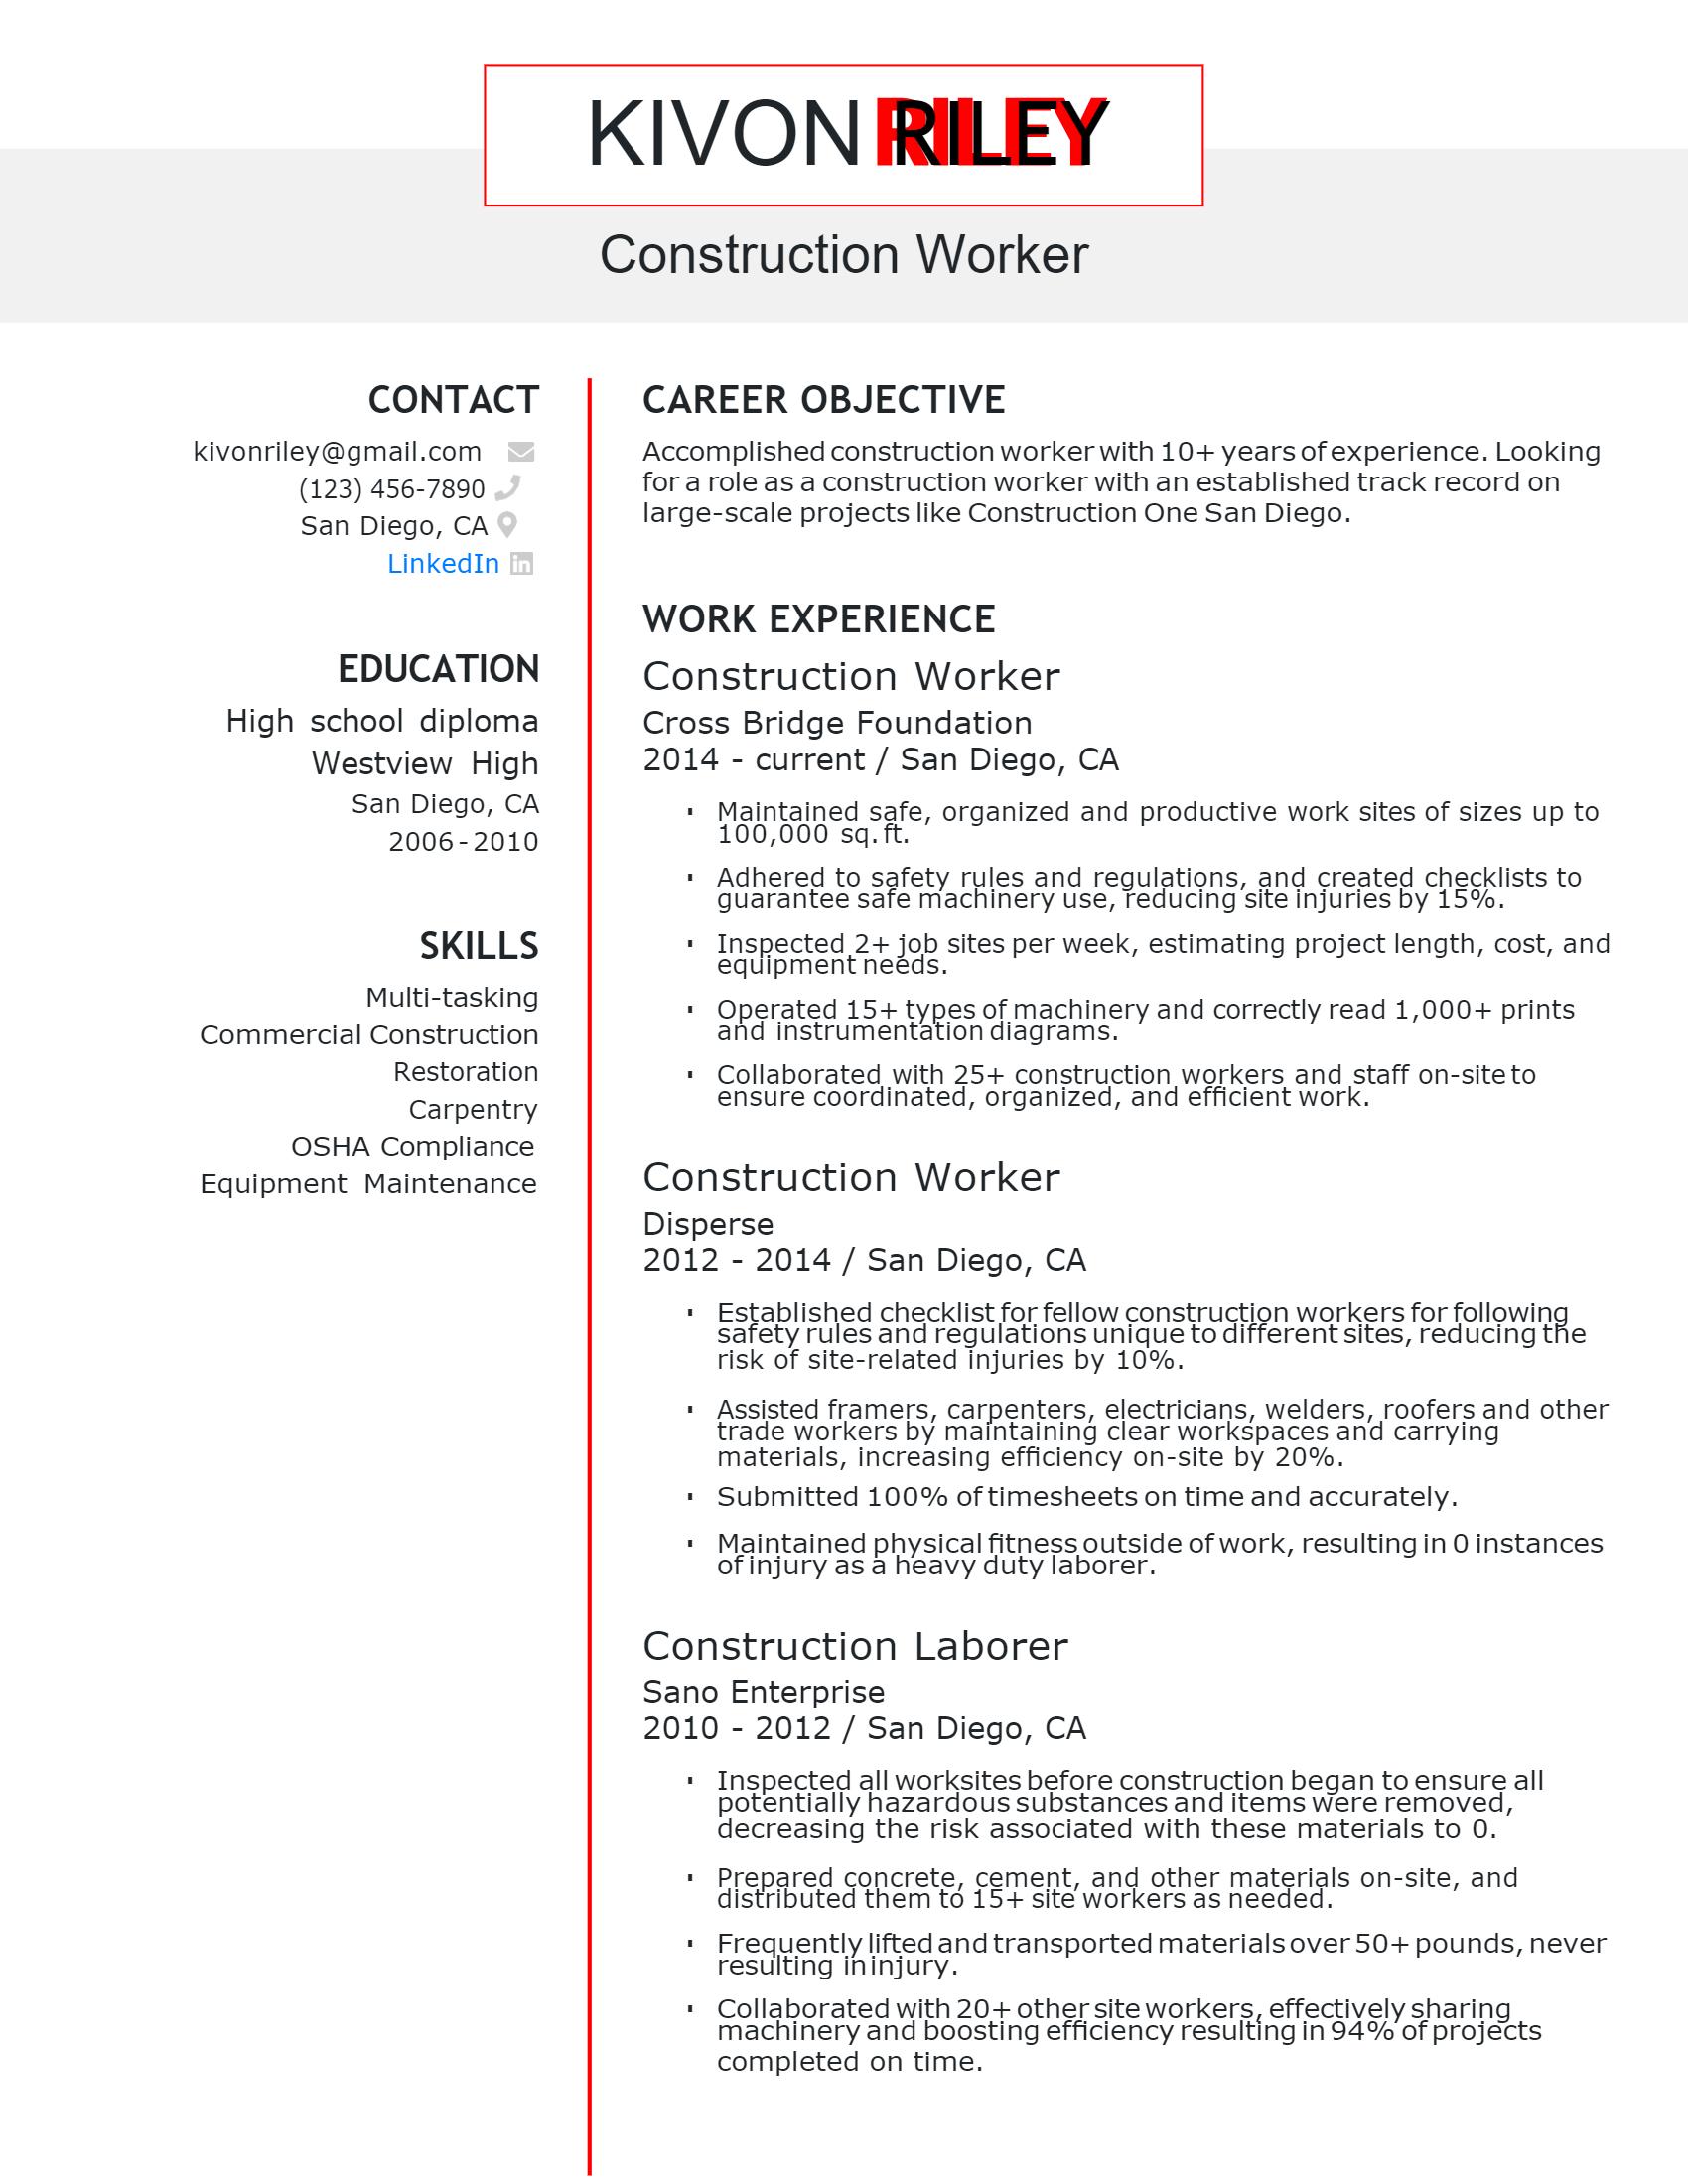 Construction Worker Resume